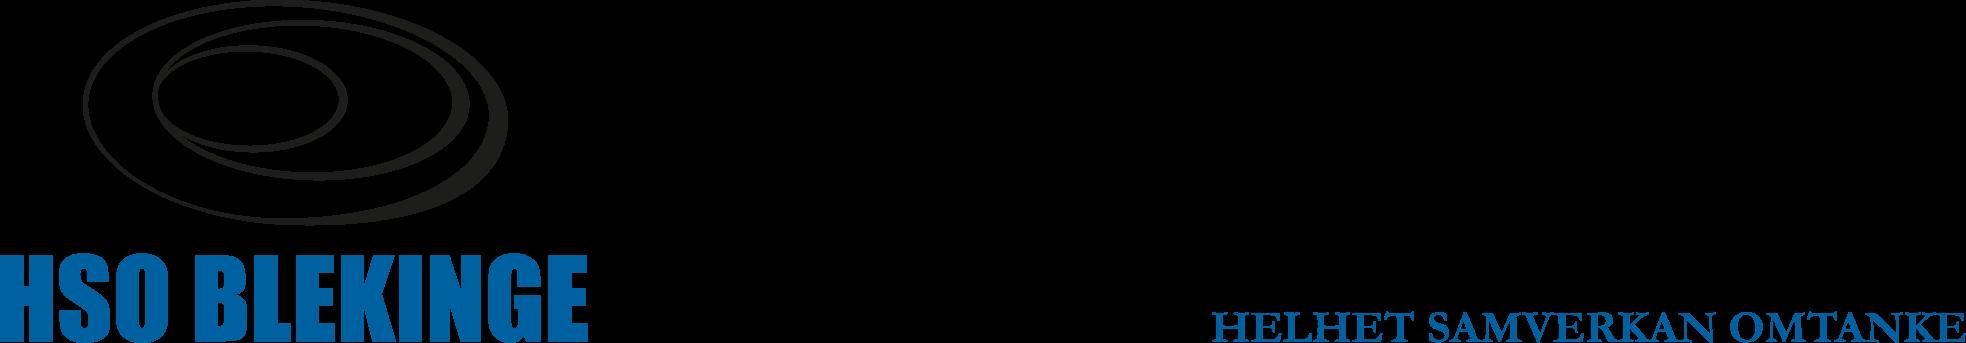 HSOBlekinge